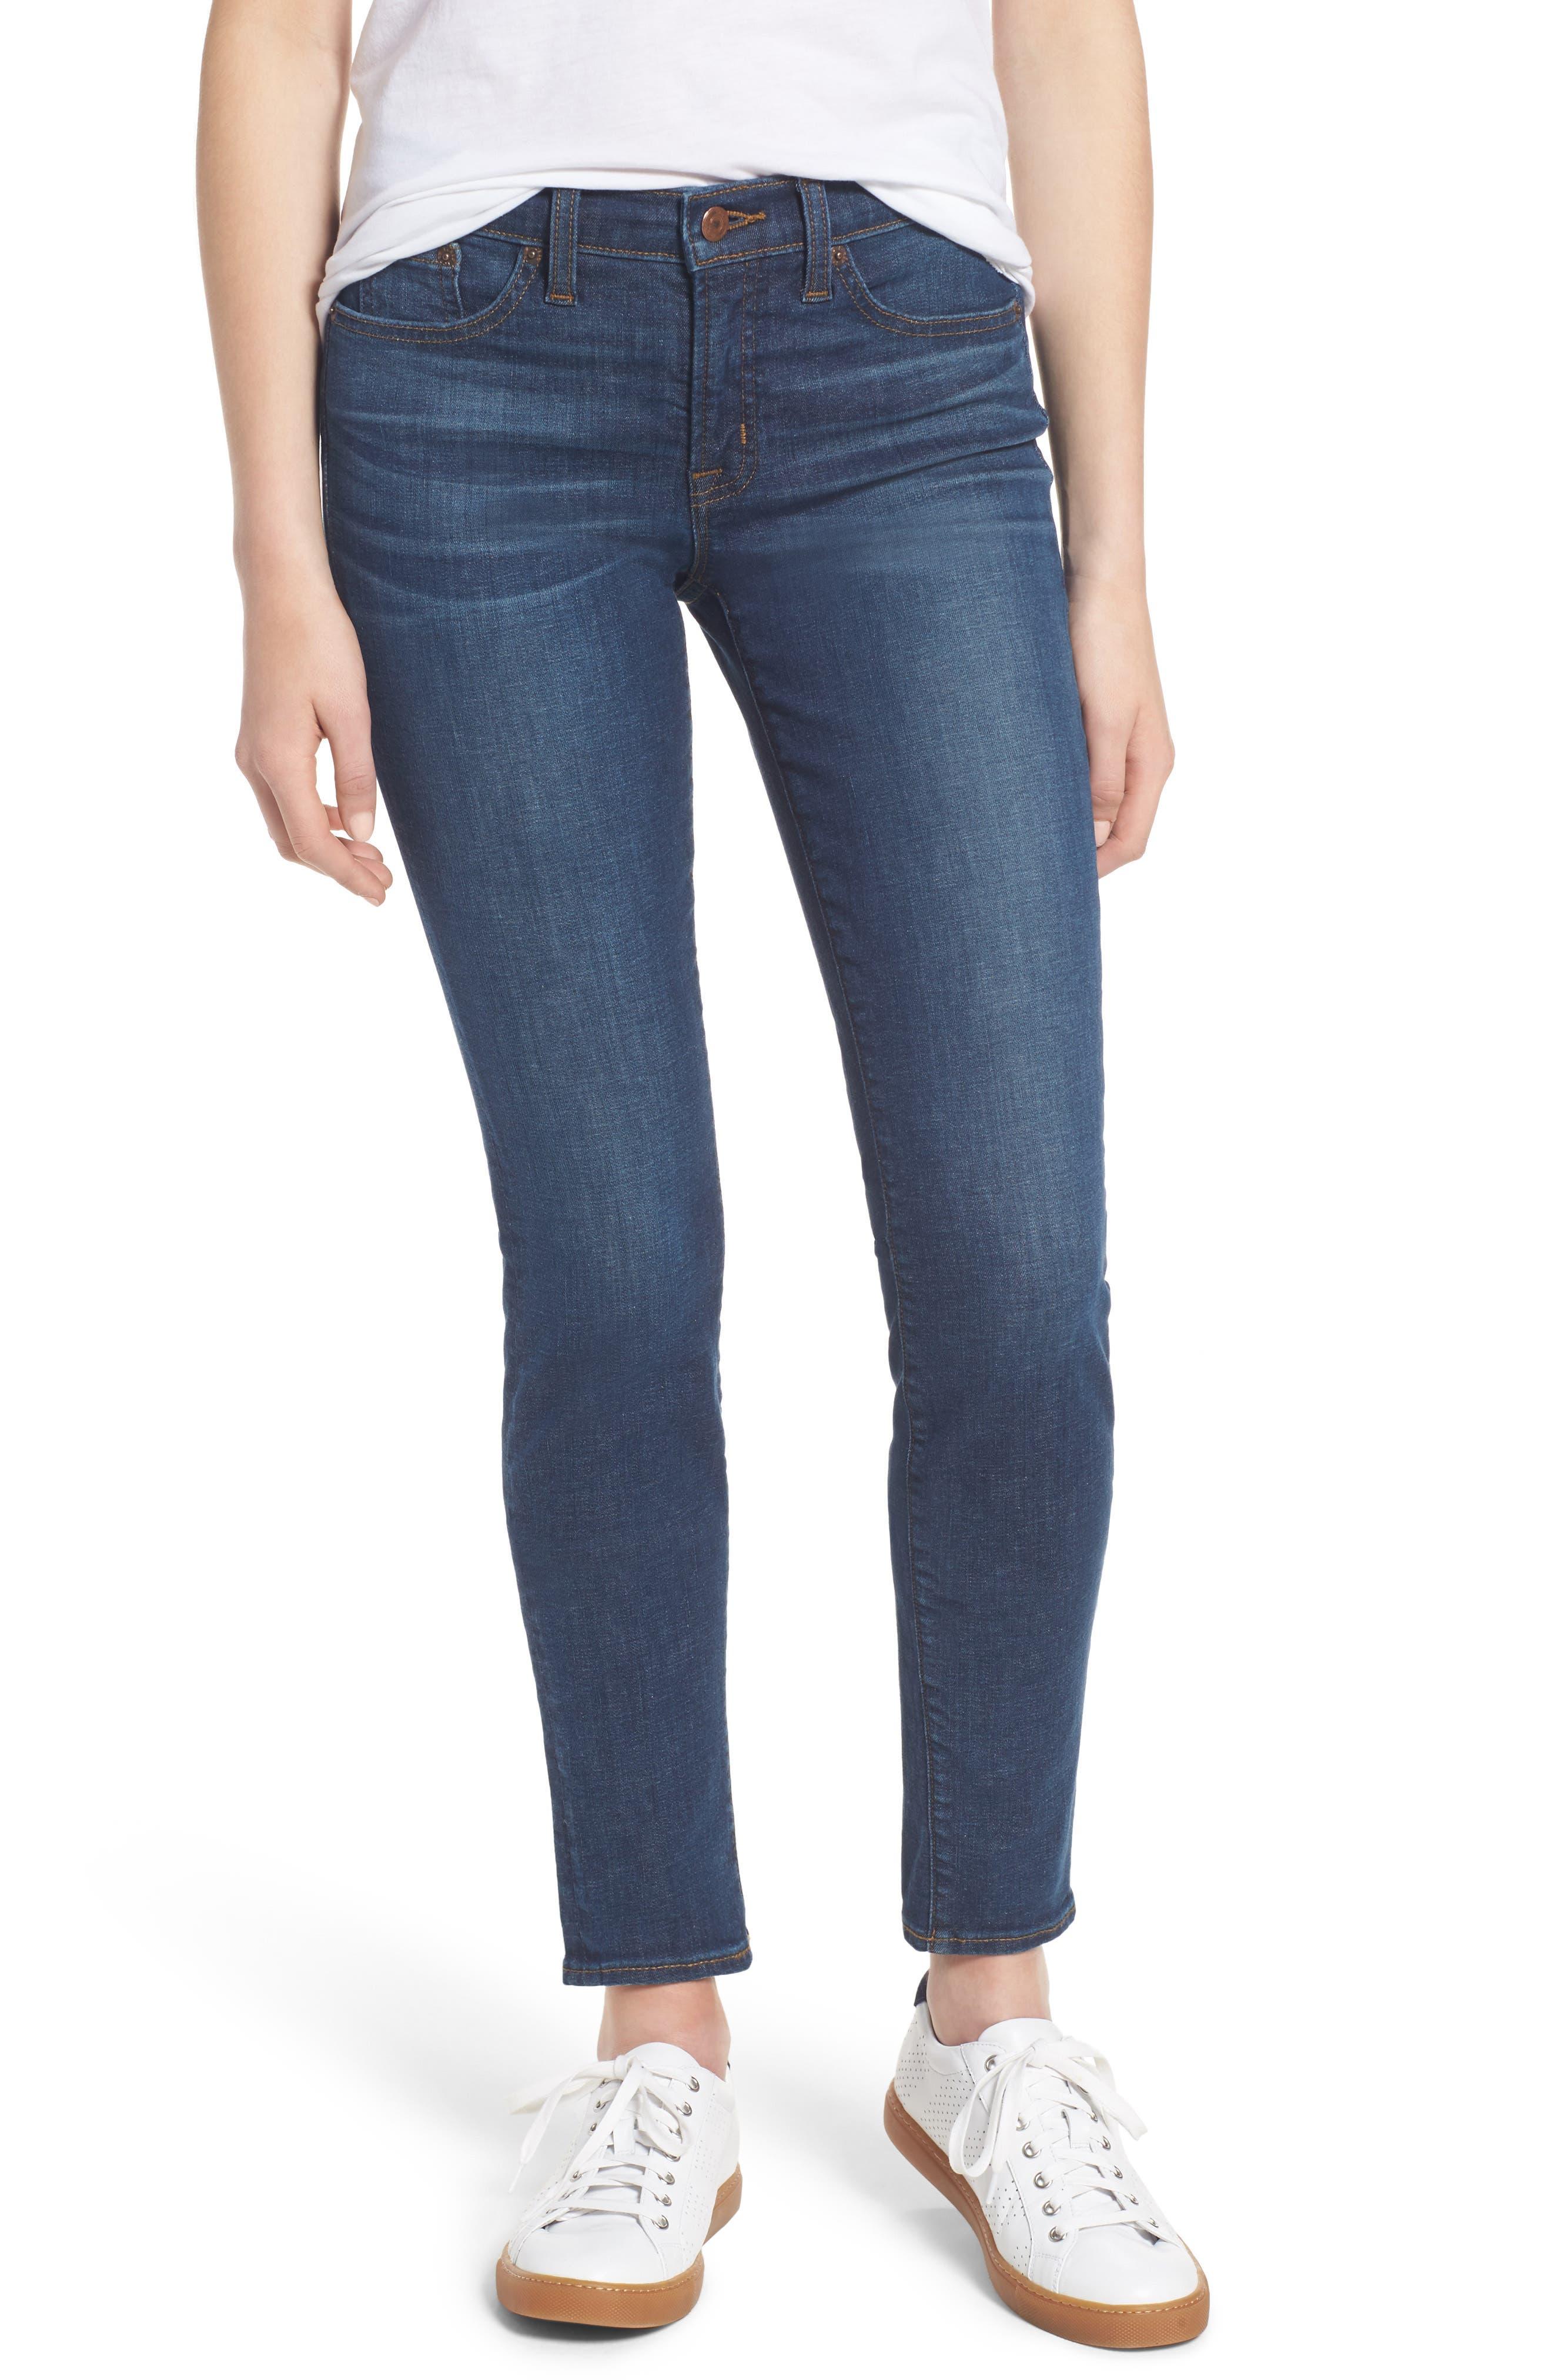 J.Crew Stretch Toothpick Jeans (Medium Miller Wash)